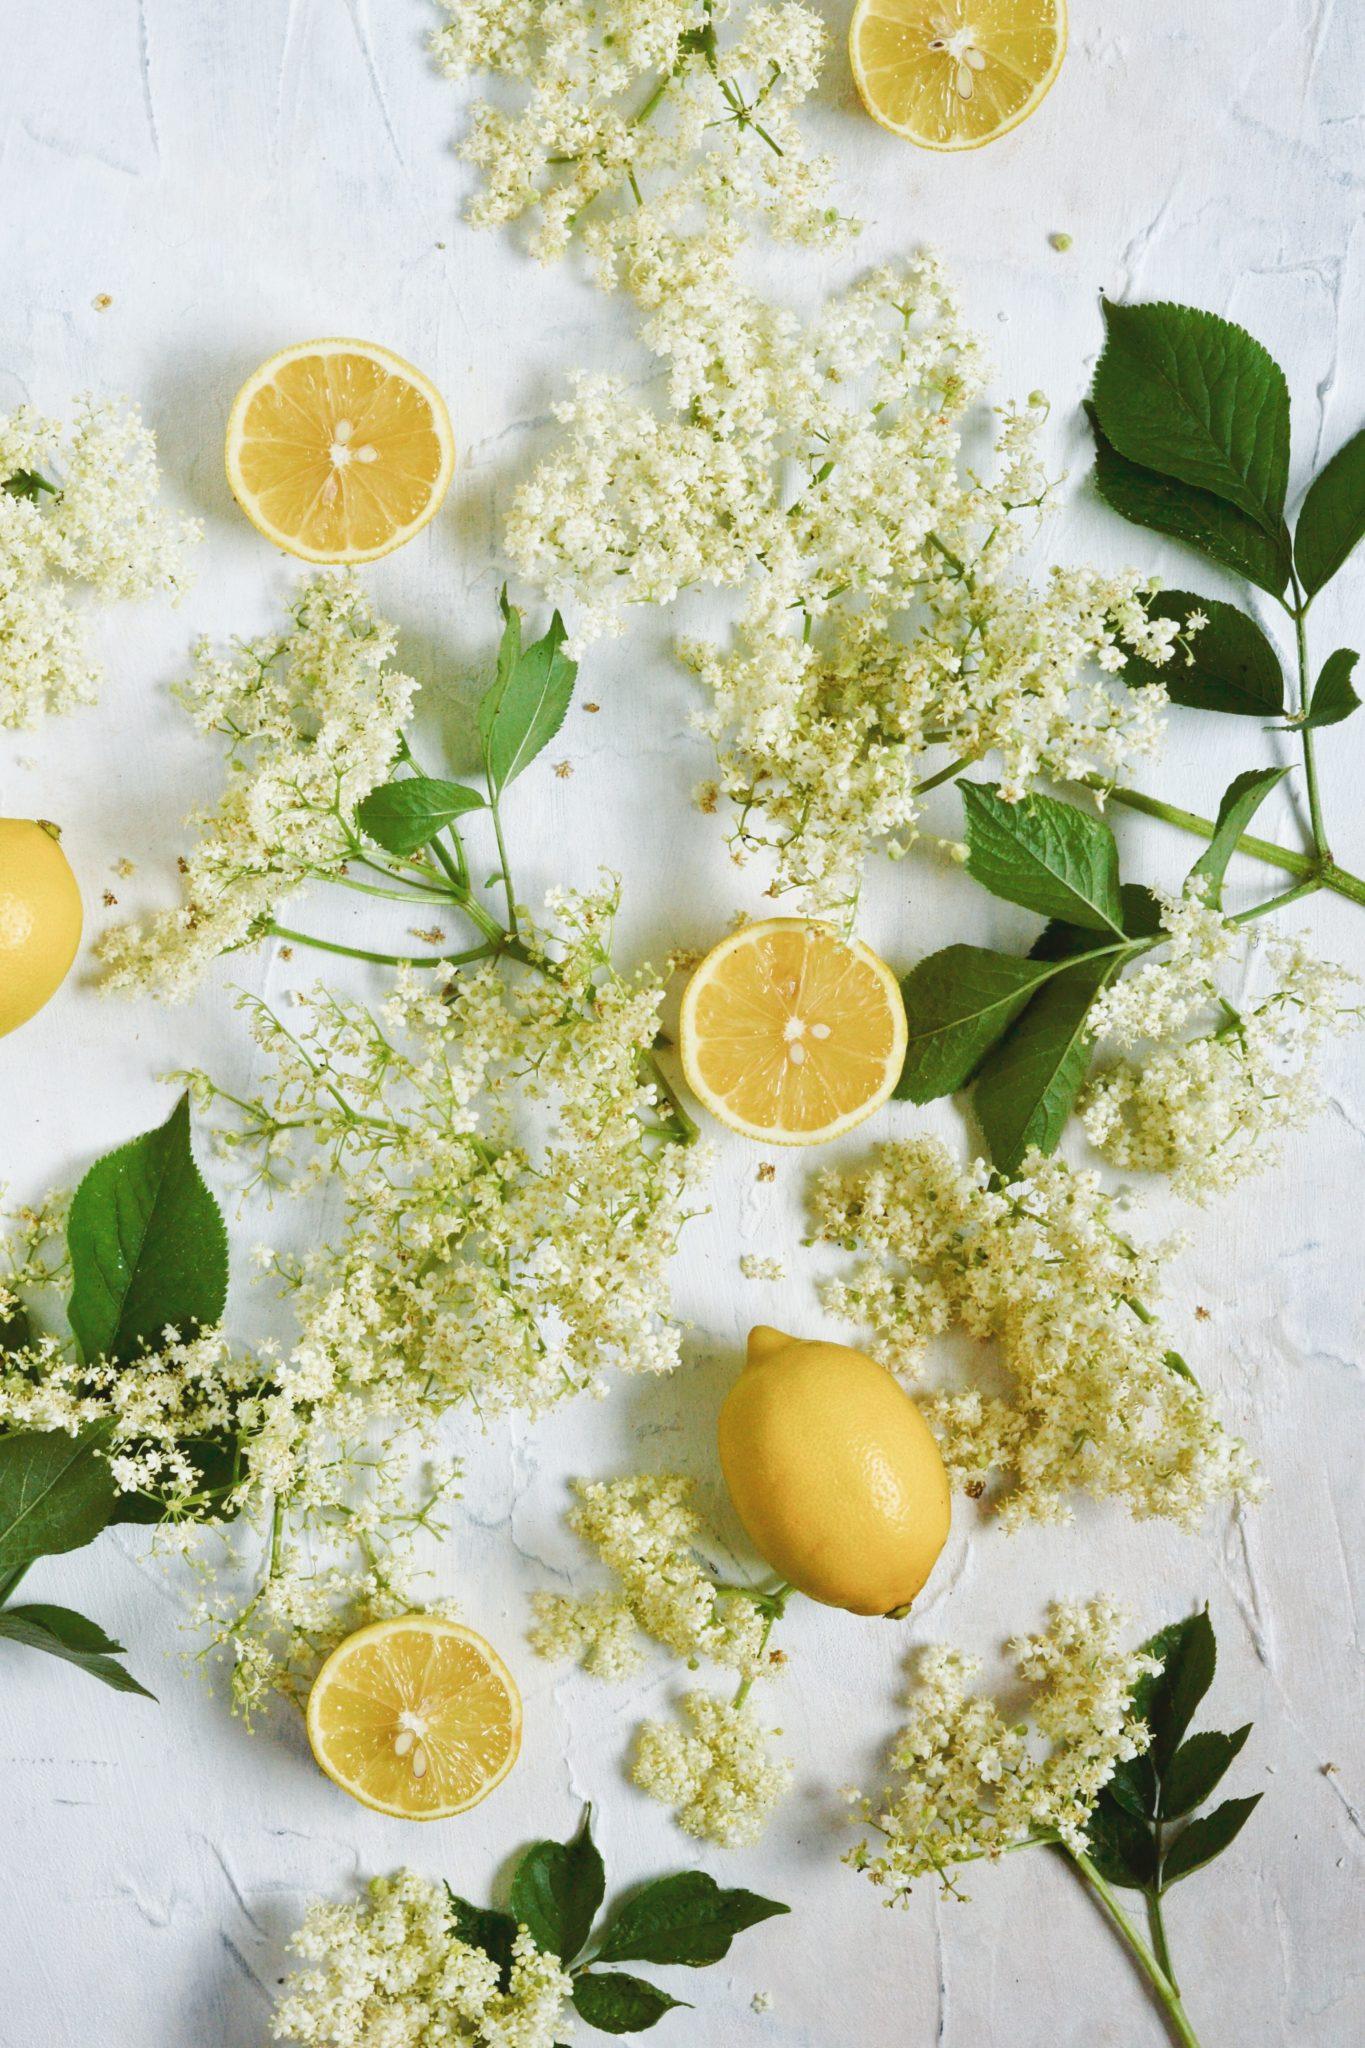 klassisk hjemmelavet hyldeblomstsaft med citron